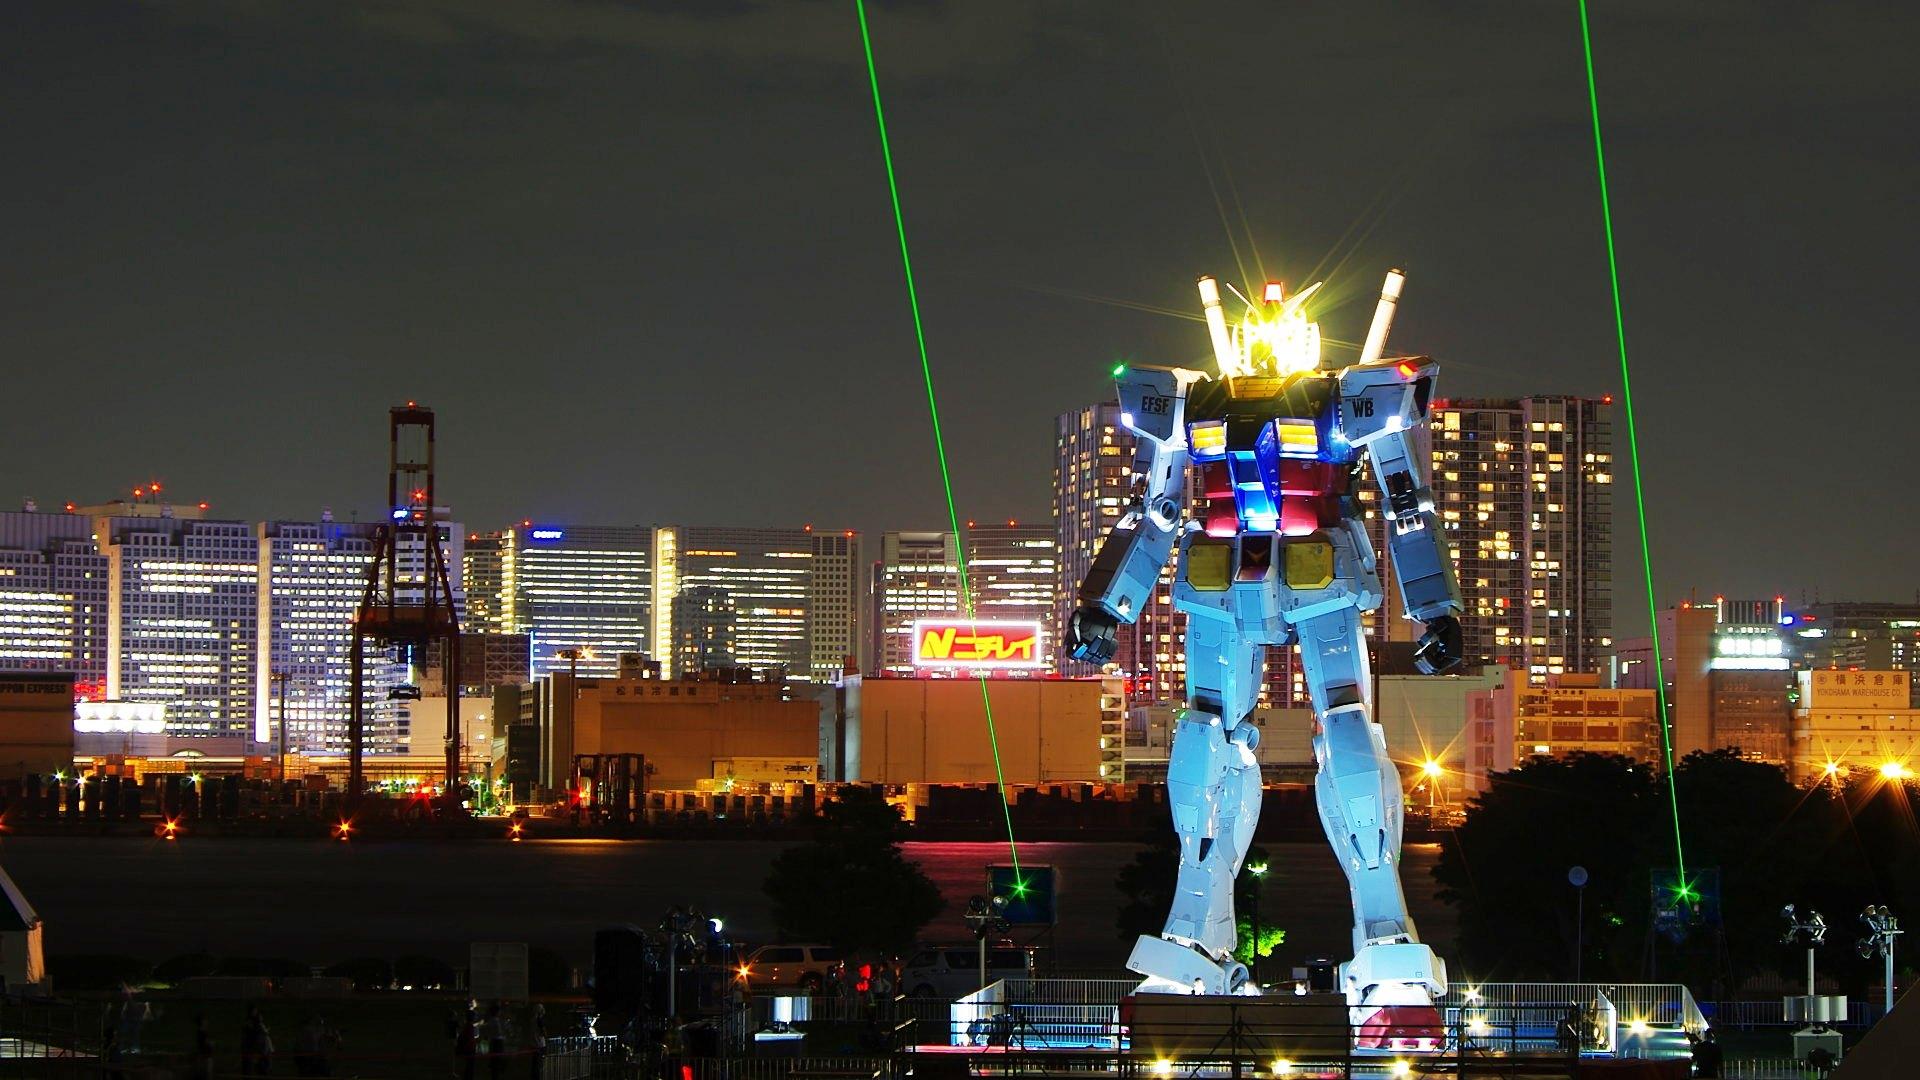 Tokyo Gundam Wallpaper 1920x1080 Tokyo Gundam Night 1920x1080